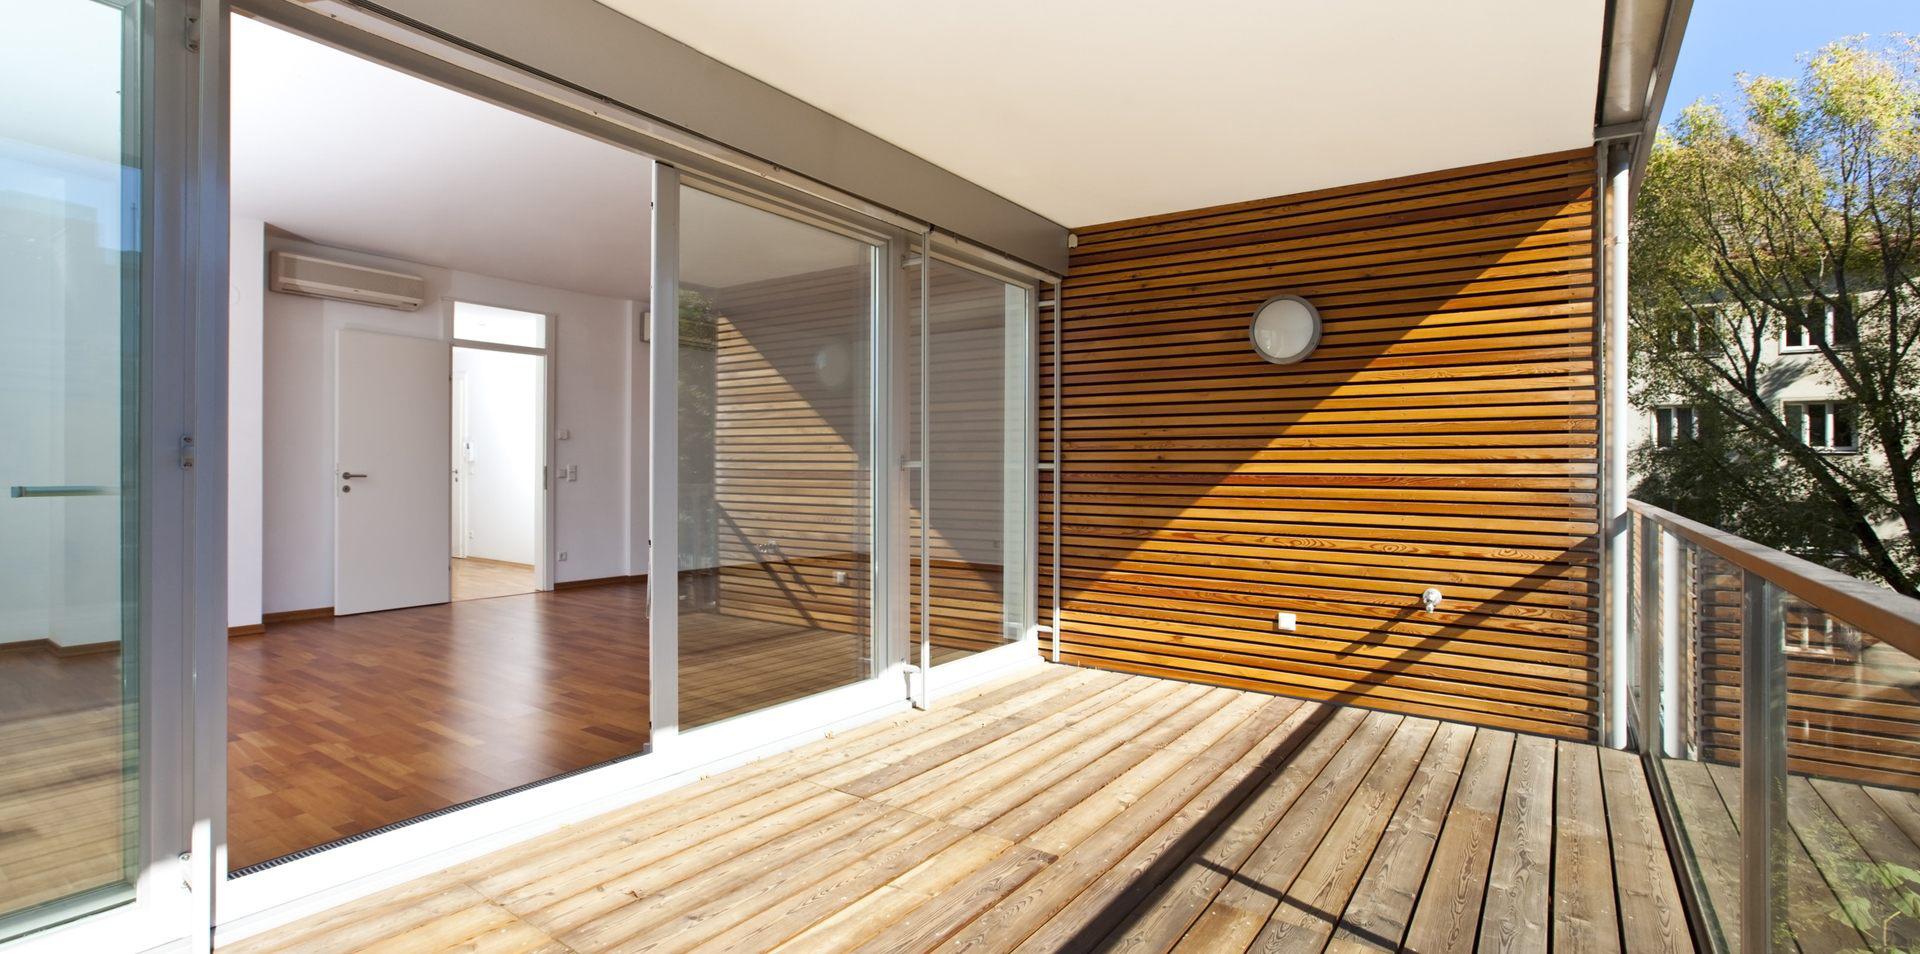 Agence immobili re situ e menton jas immobilier 06500 for Agence immobiliere menton